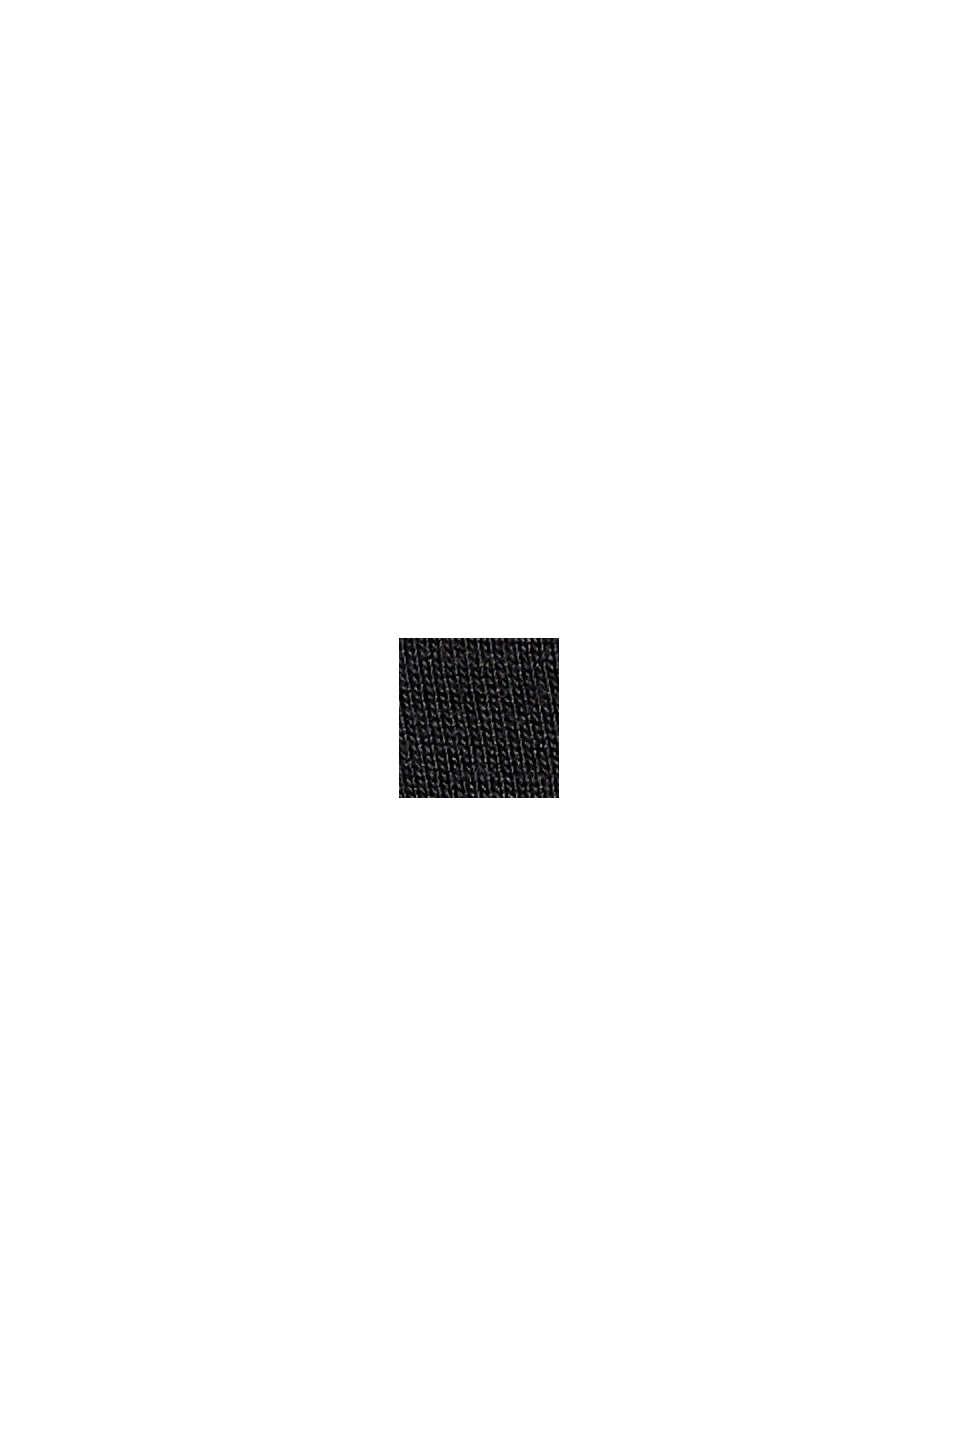 T-shirt made of TENCEL™ x REFIBRA™, BLACK, swatch